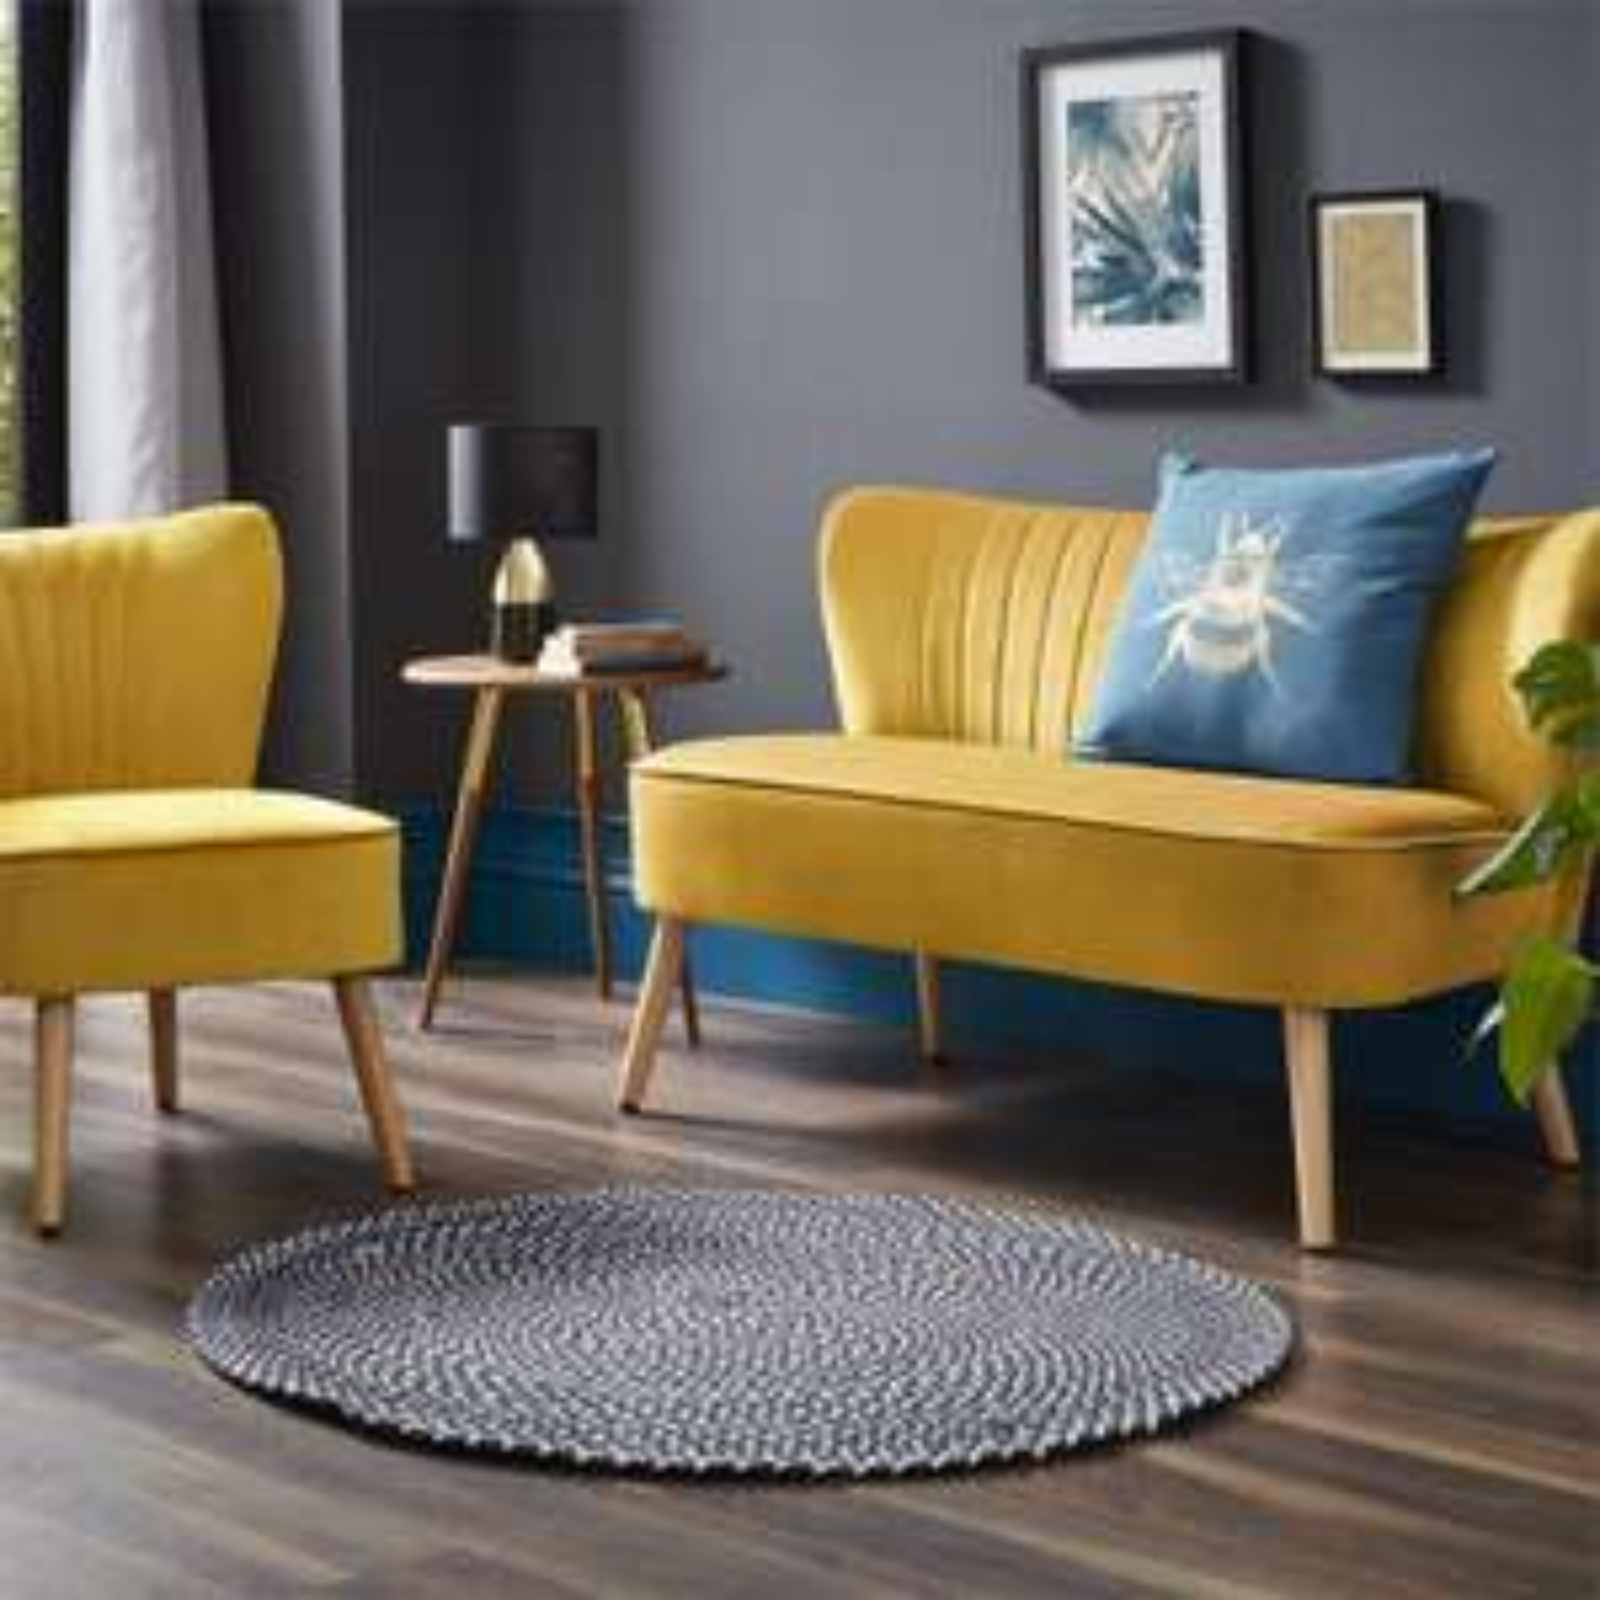 Cocktail Sofa (Grey/ Ochre/ Dark Bush) - £120 Delivered / Occasional Chair £60 Delivered @ Homebase